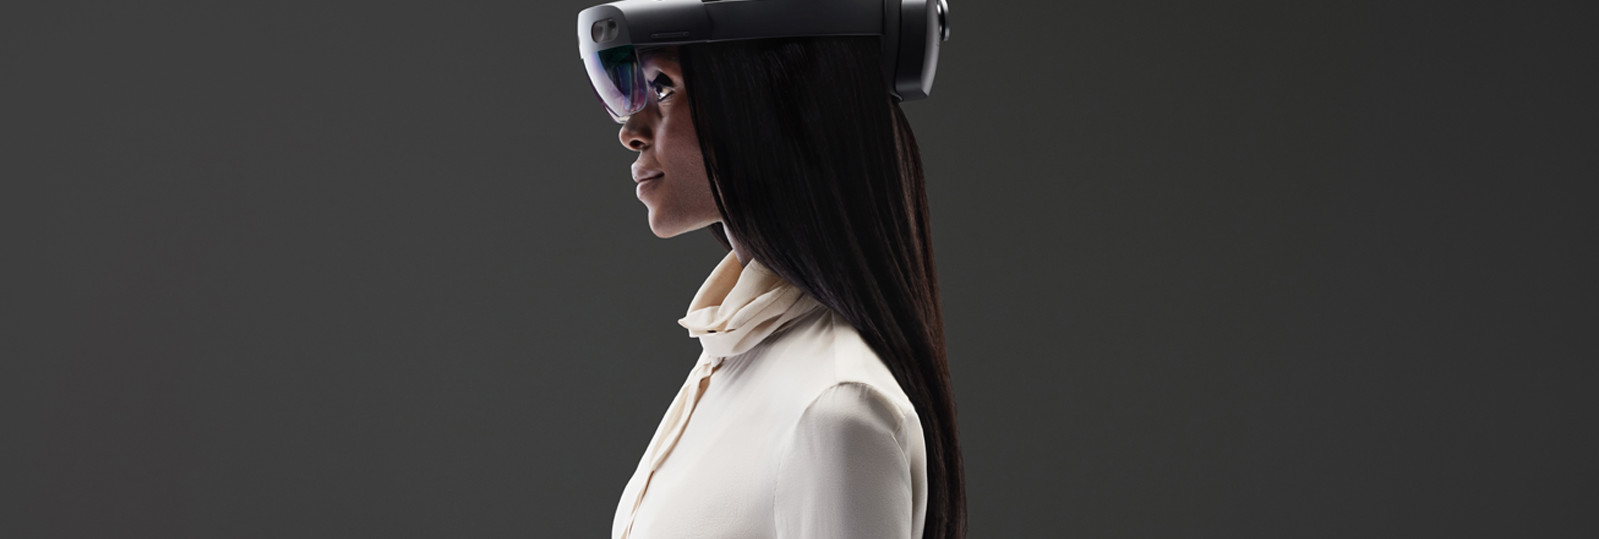 Nehmen Sie am Mixed-Reality-Partnerprogramm teil | Microsoft